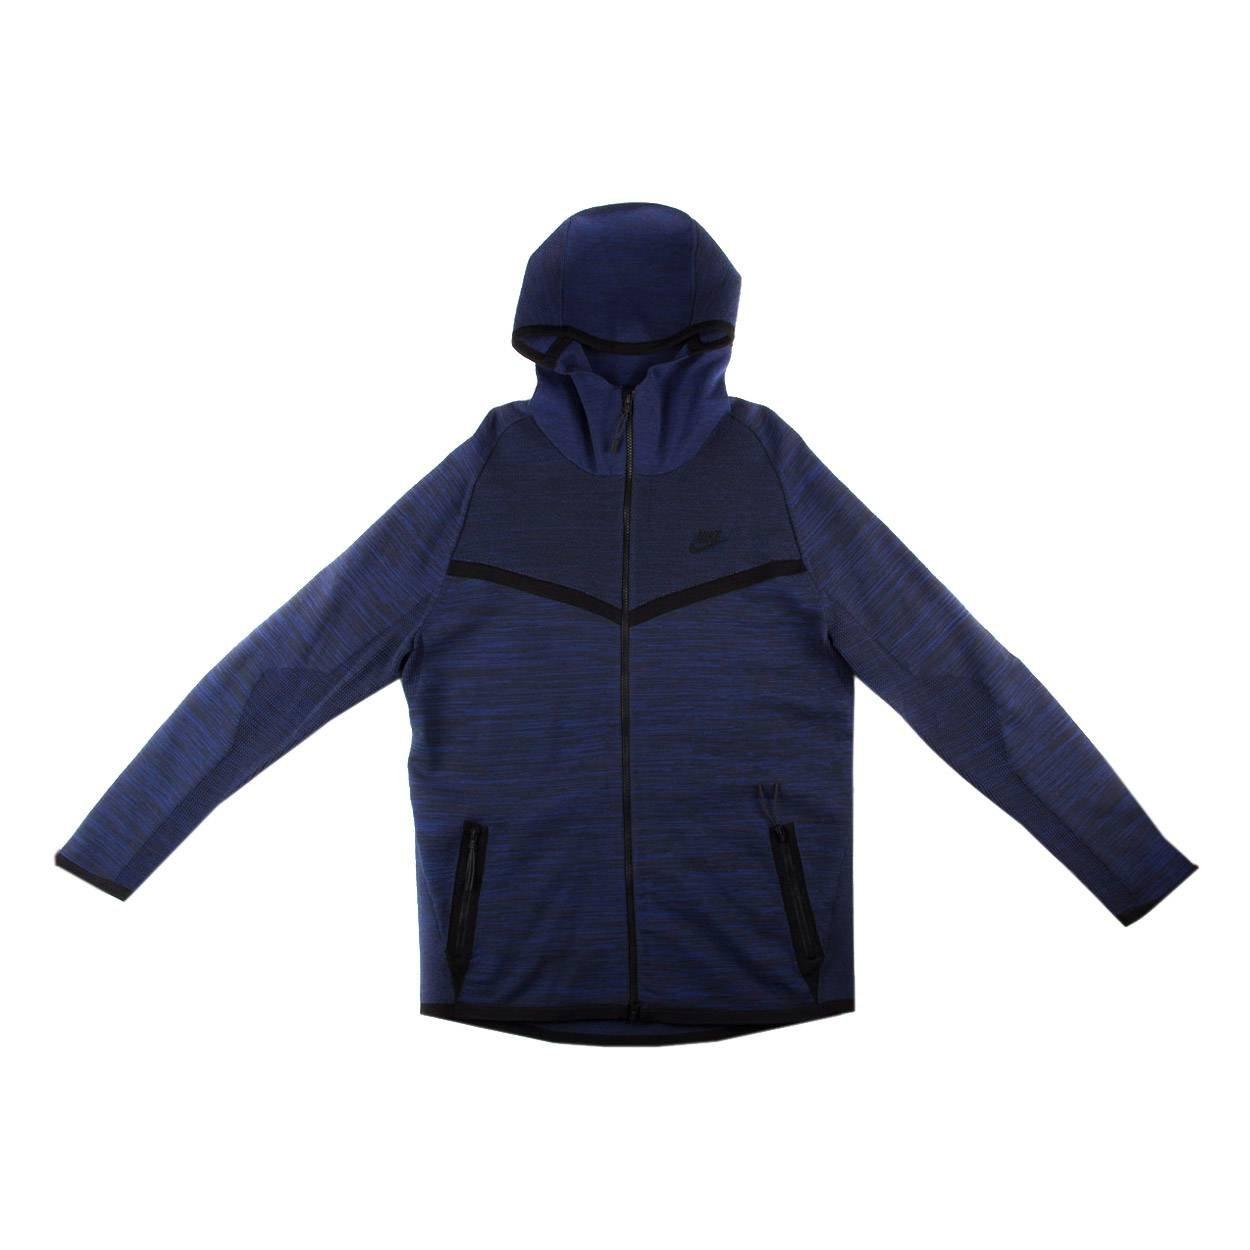 Amazon.com  Nike Men s Tech Knit Windrunner Jacket Deep Royal Blue Obsidian  Medium  Sports   Outdoors 5f9cc889e